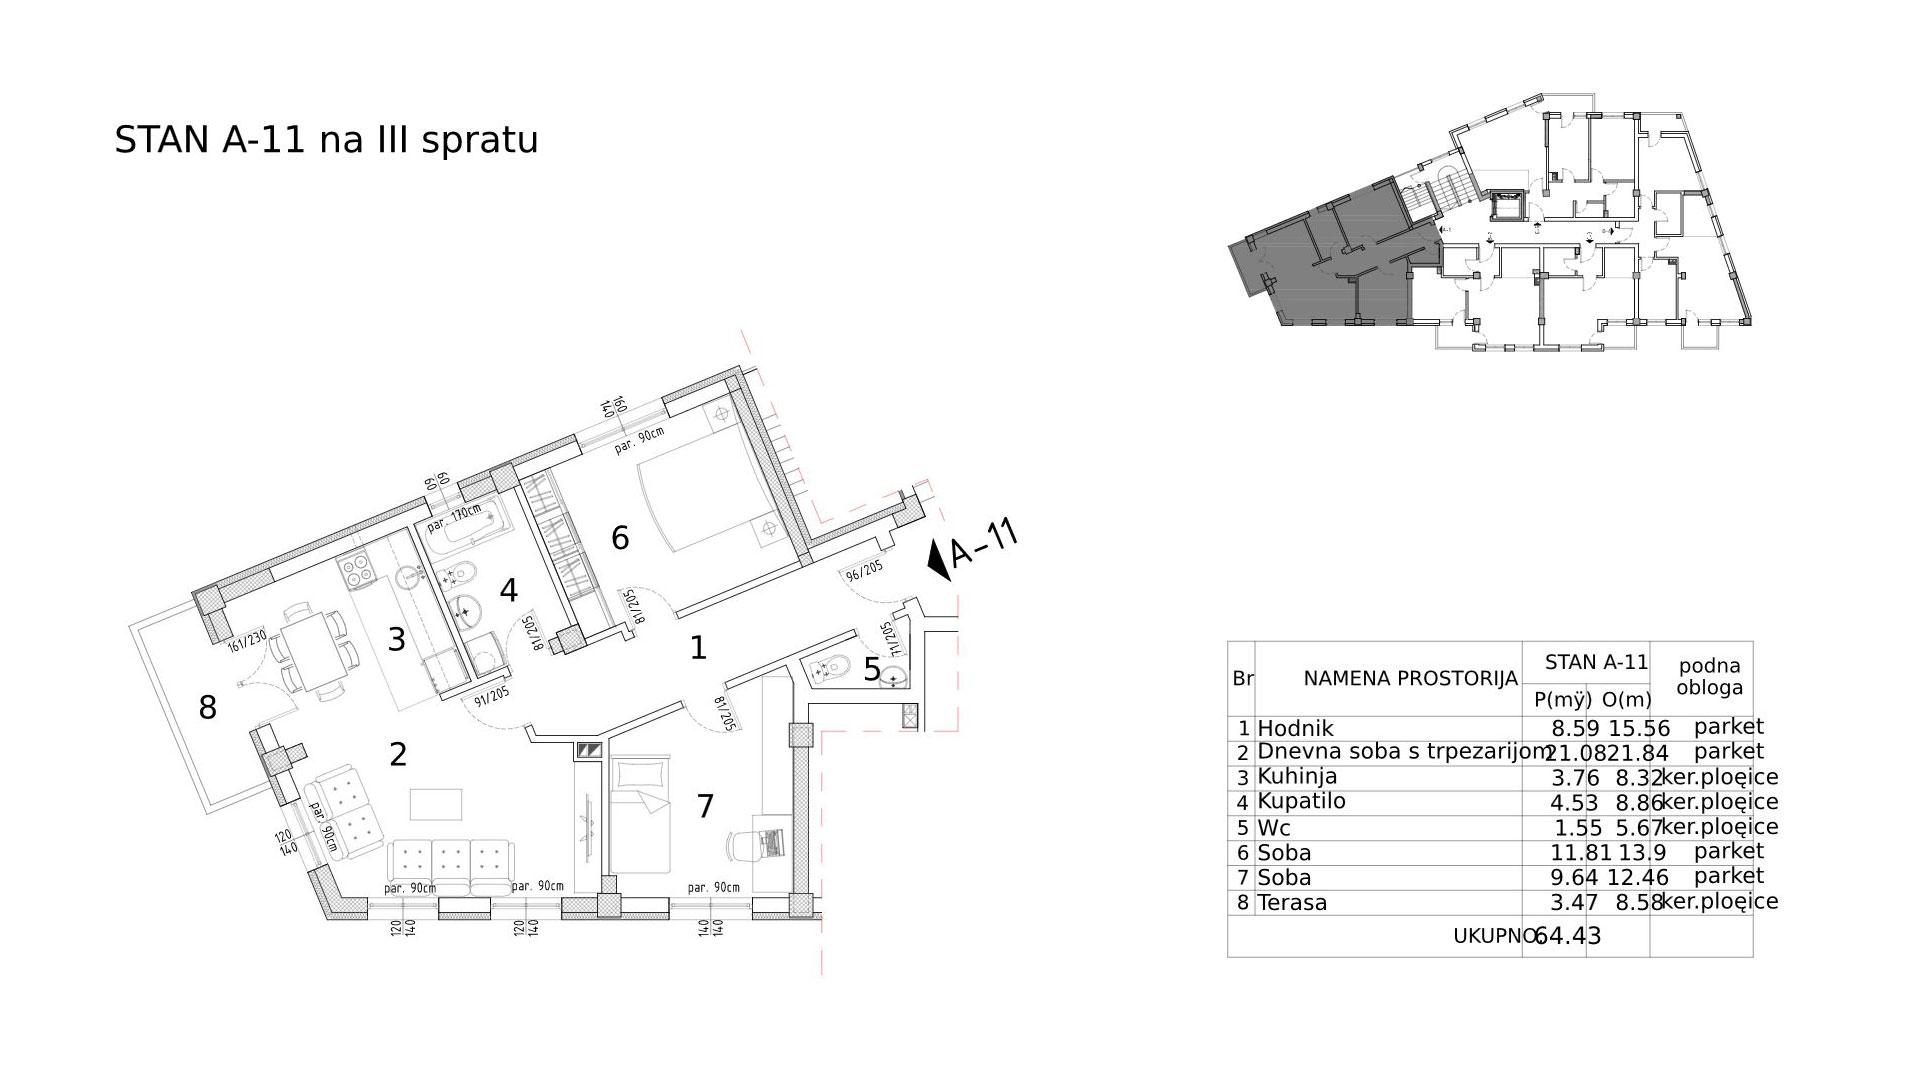 Objekat u Somborskoj 79 - stan A11